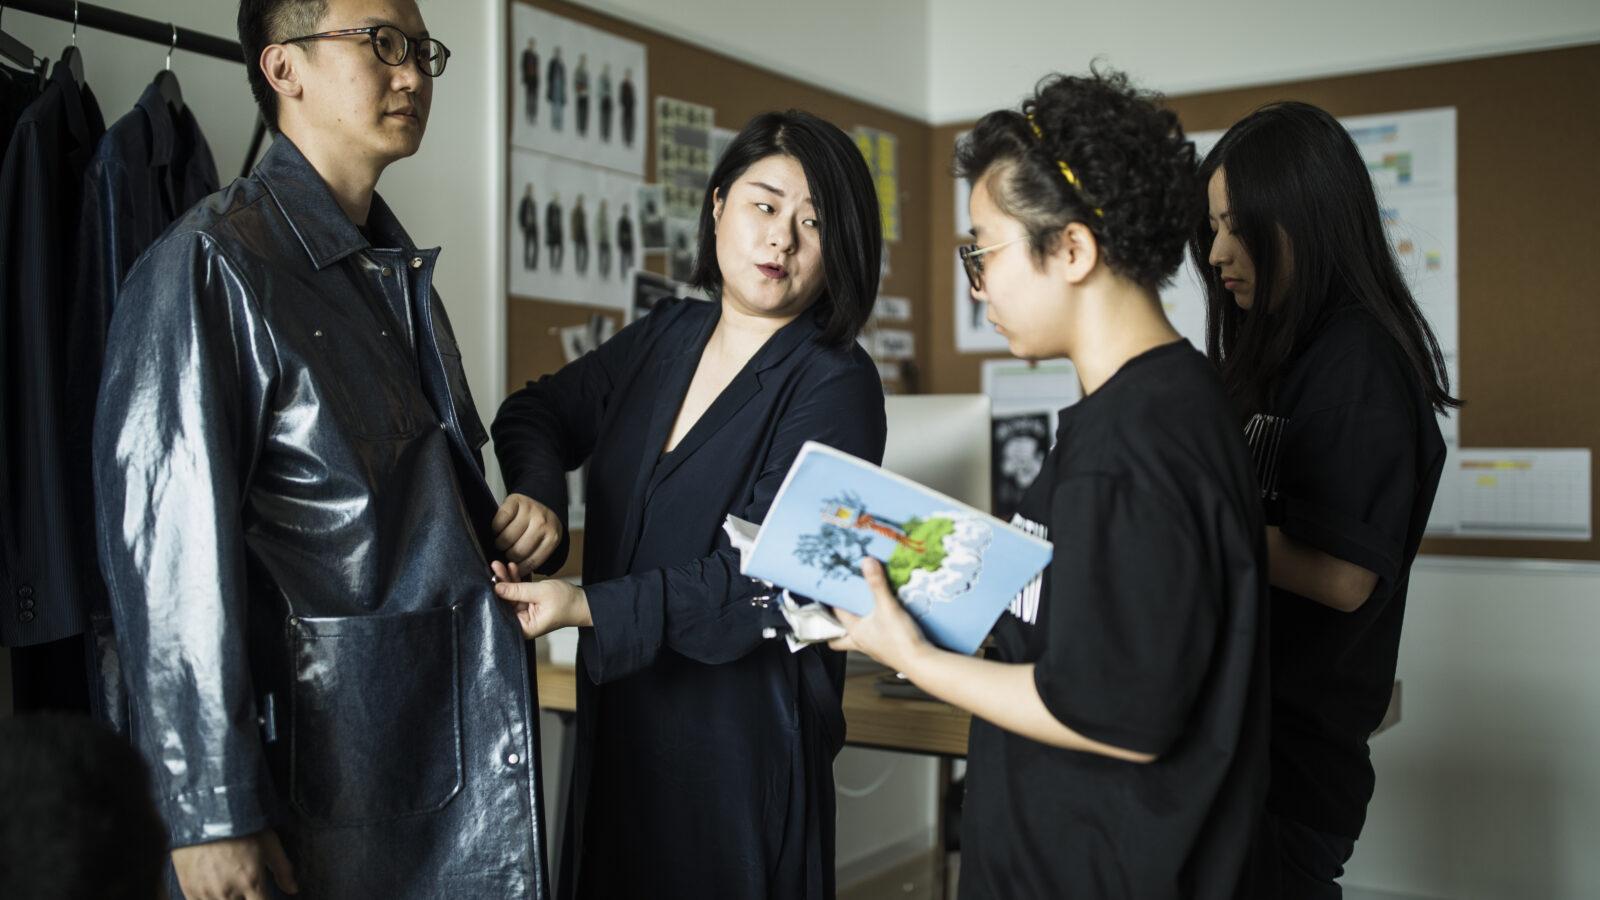 Masha Ma with her design team at the Mattitude Studio in Shanghai.